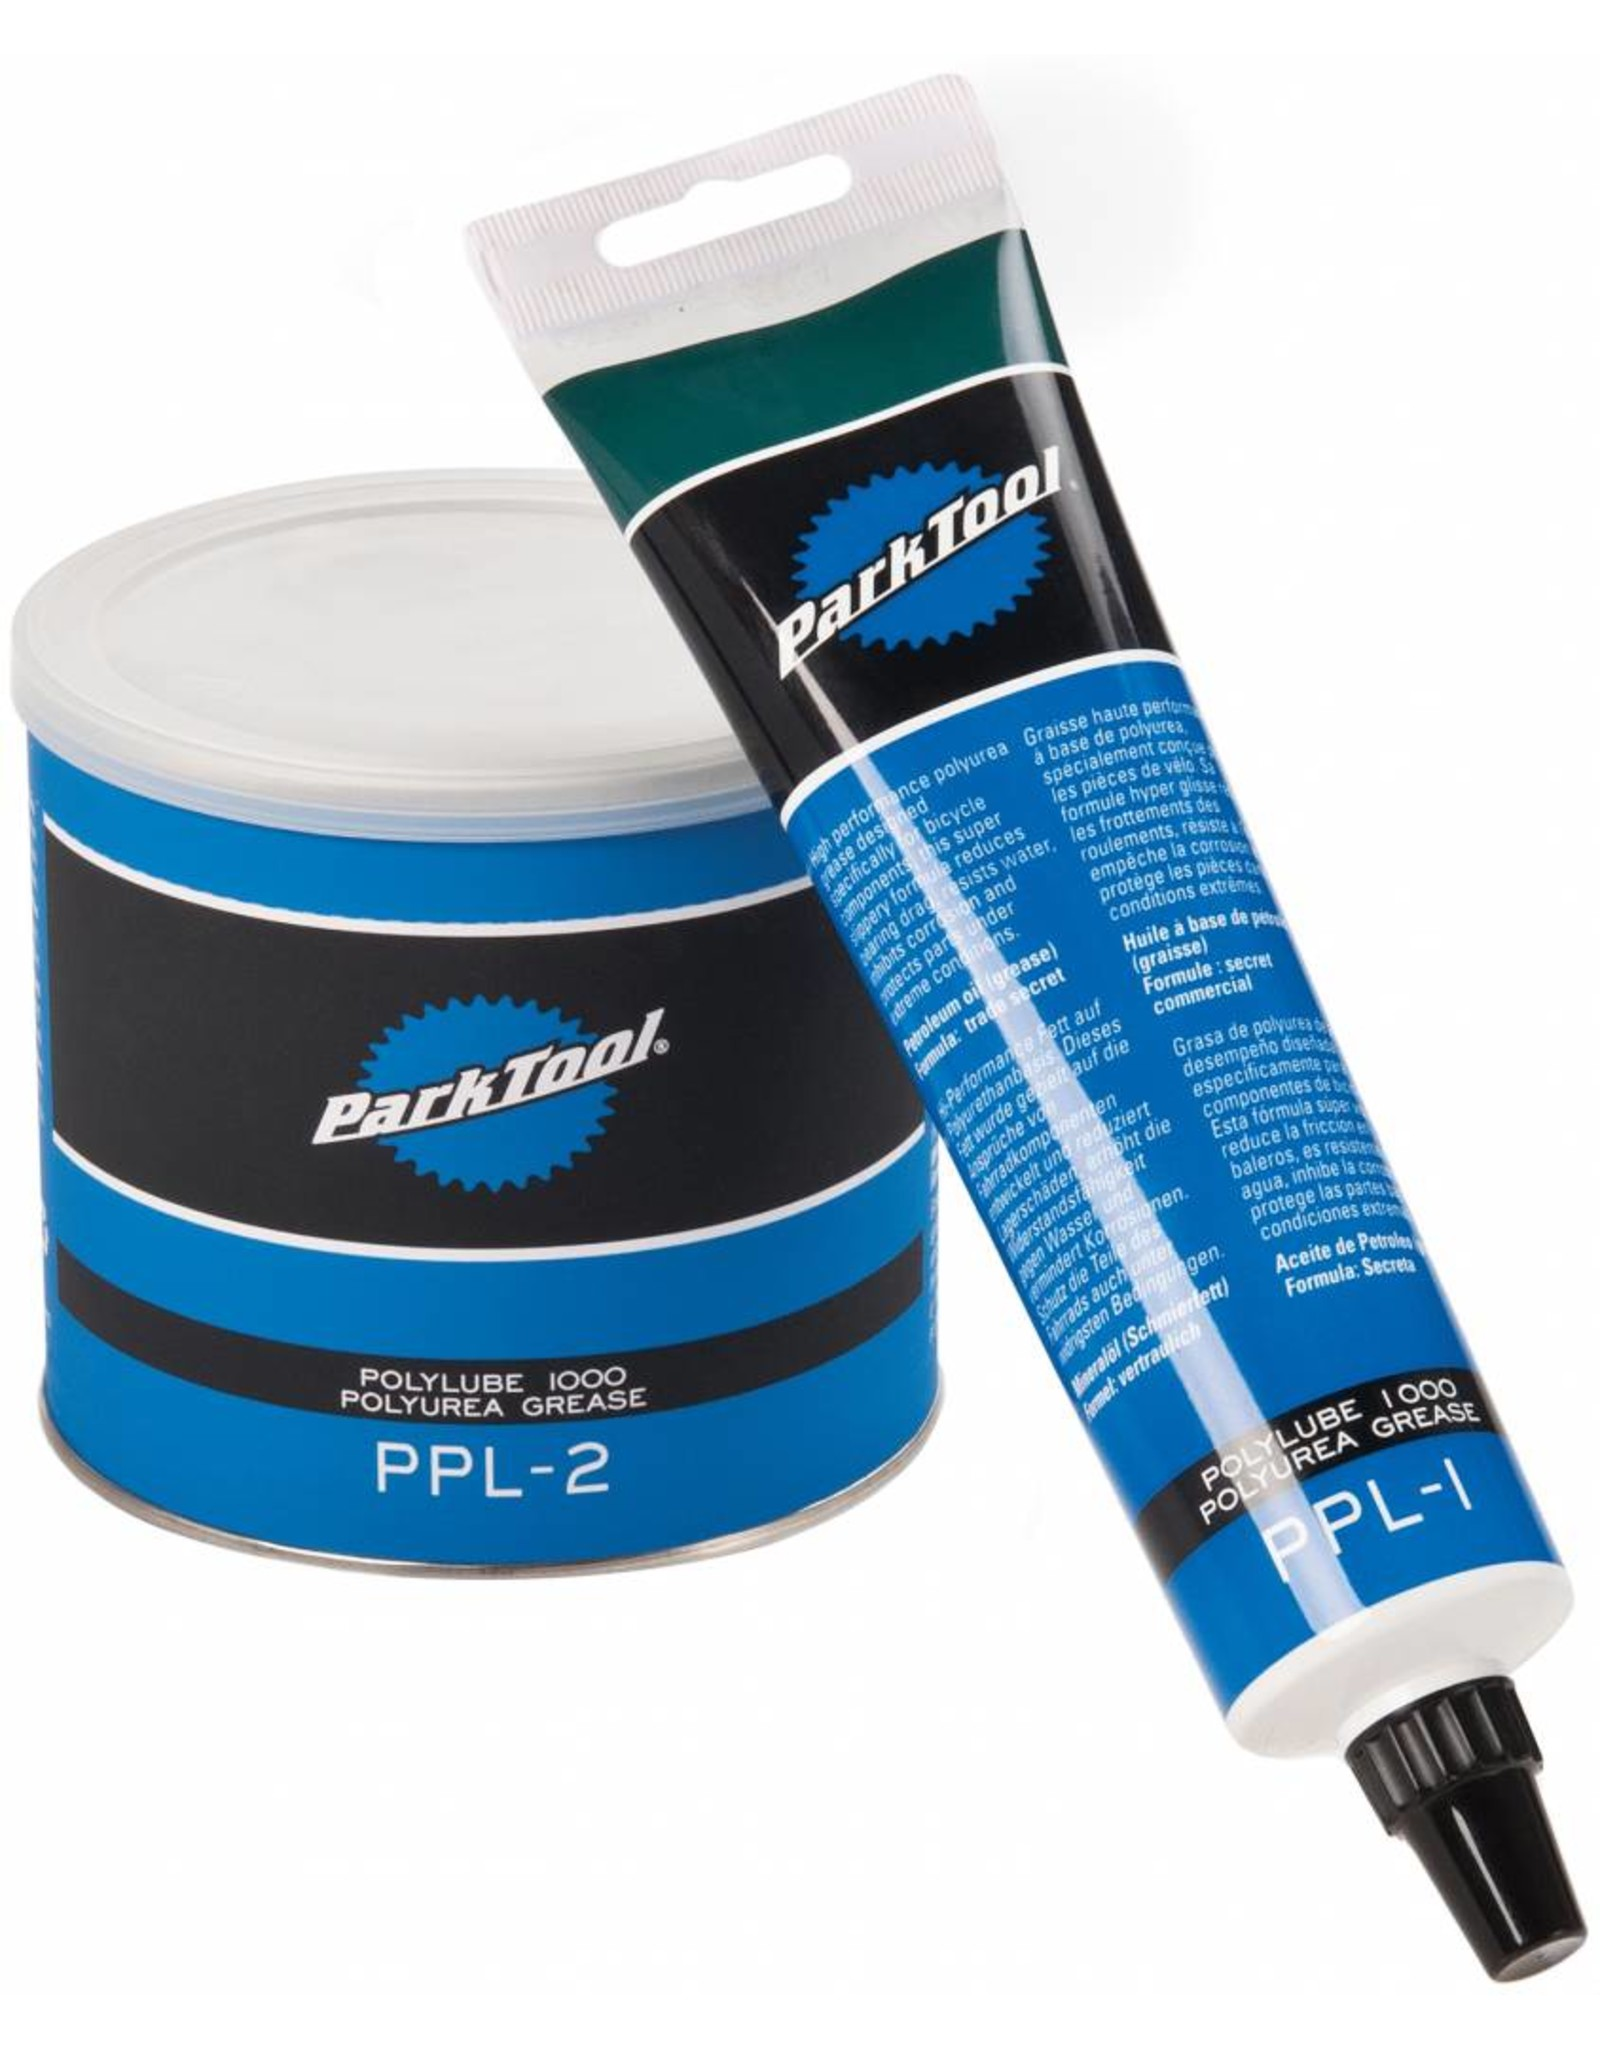 Graisse multi usages Park Tool PPL-1